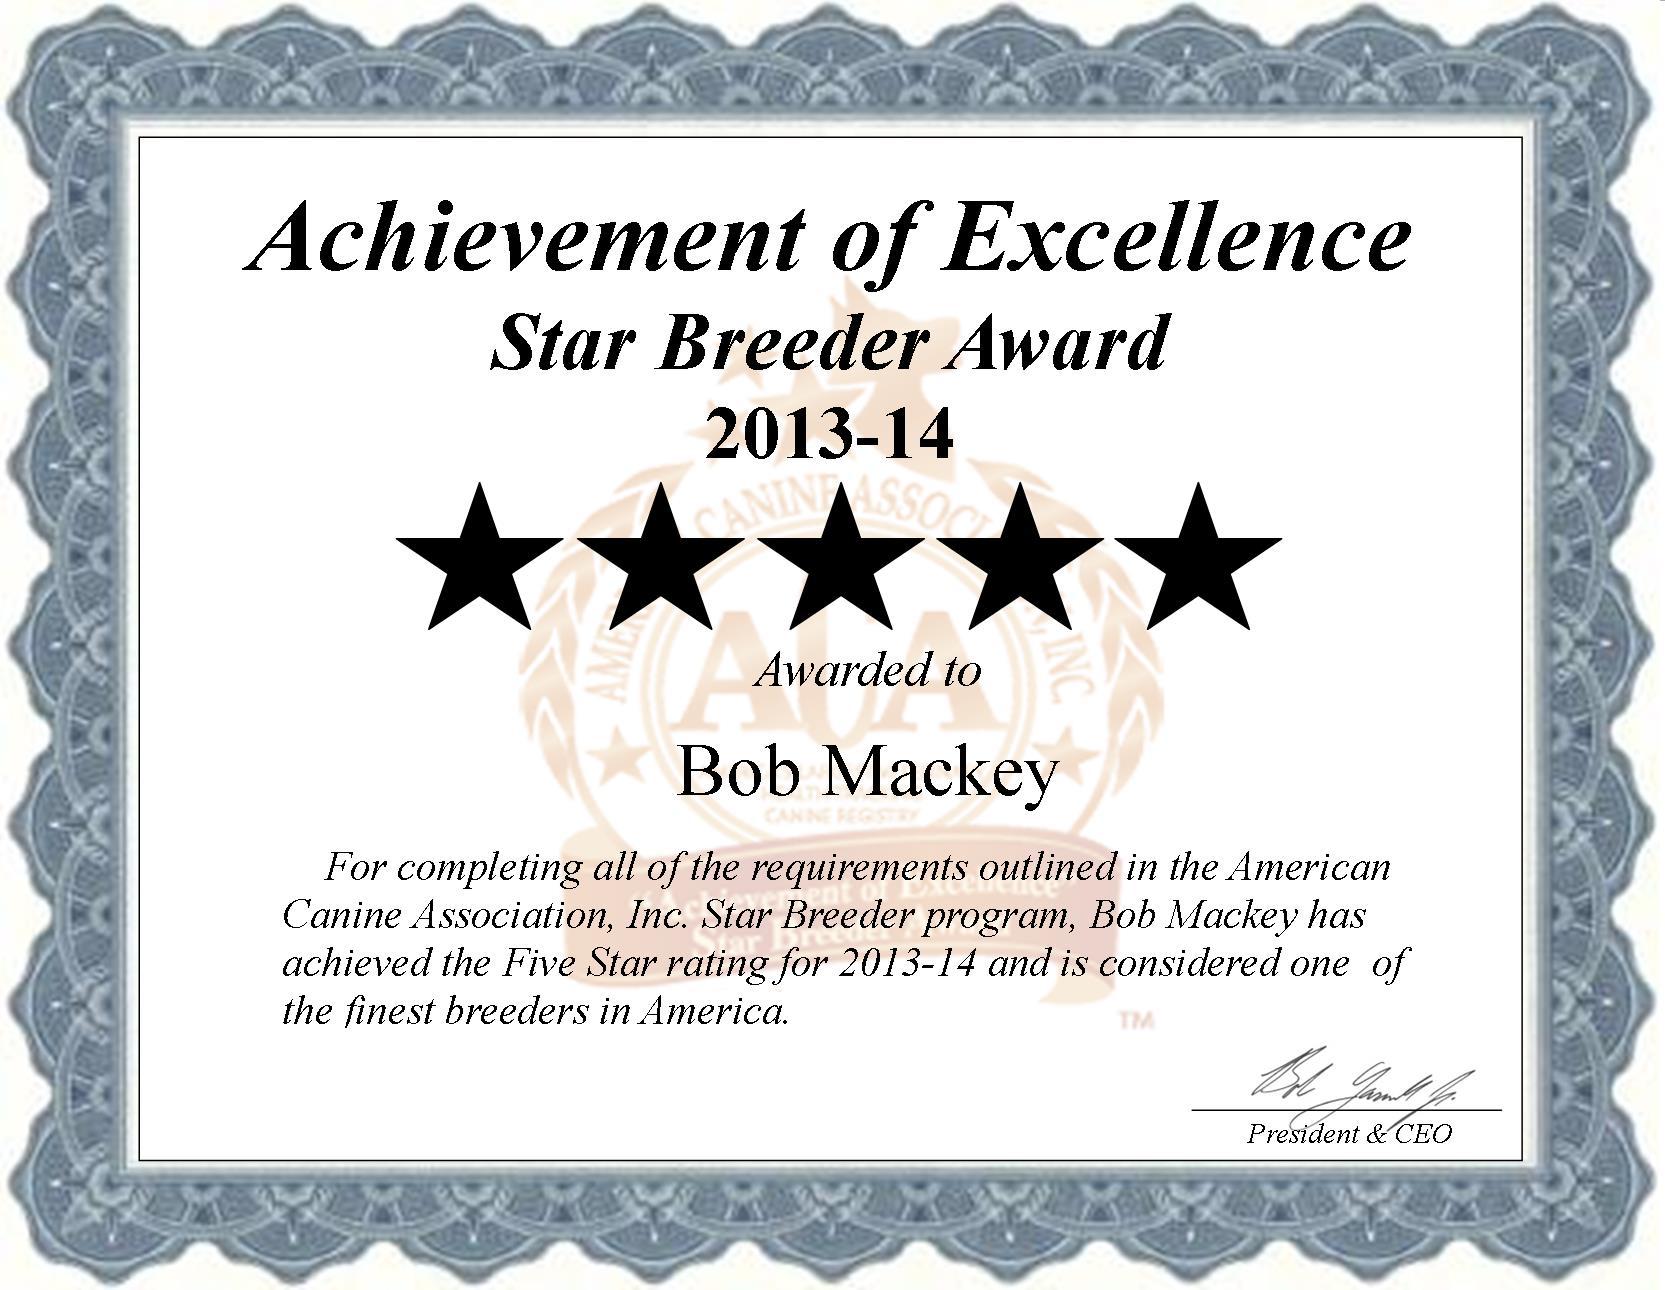 Bob Mackey, Mackey Kennel, Mackey do breeder, star breeder, aca, star breeder, 5 star, Sayre, Oklahoma, OK, dog, puppy, puppies, dog breeder, dog breeders, Oklahoma breeder, Bob Mackey dog breeder